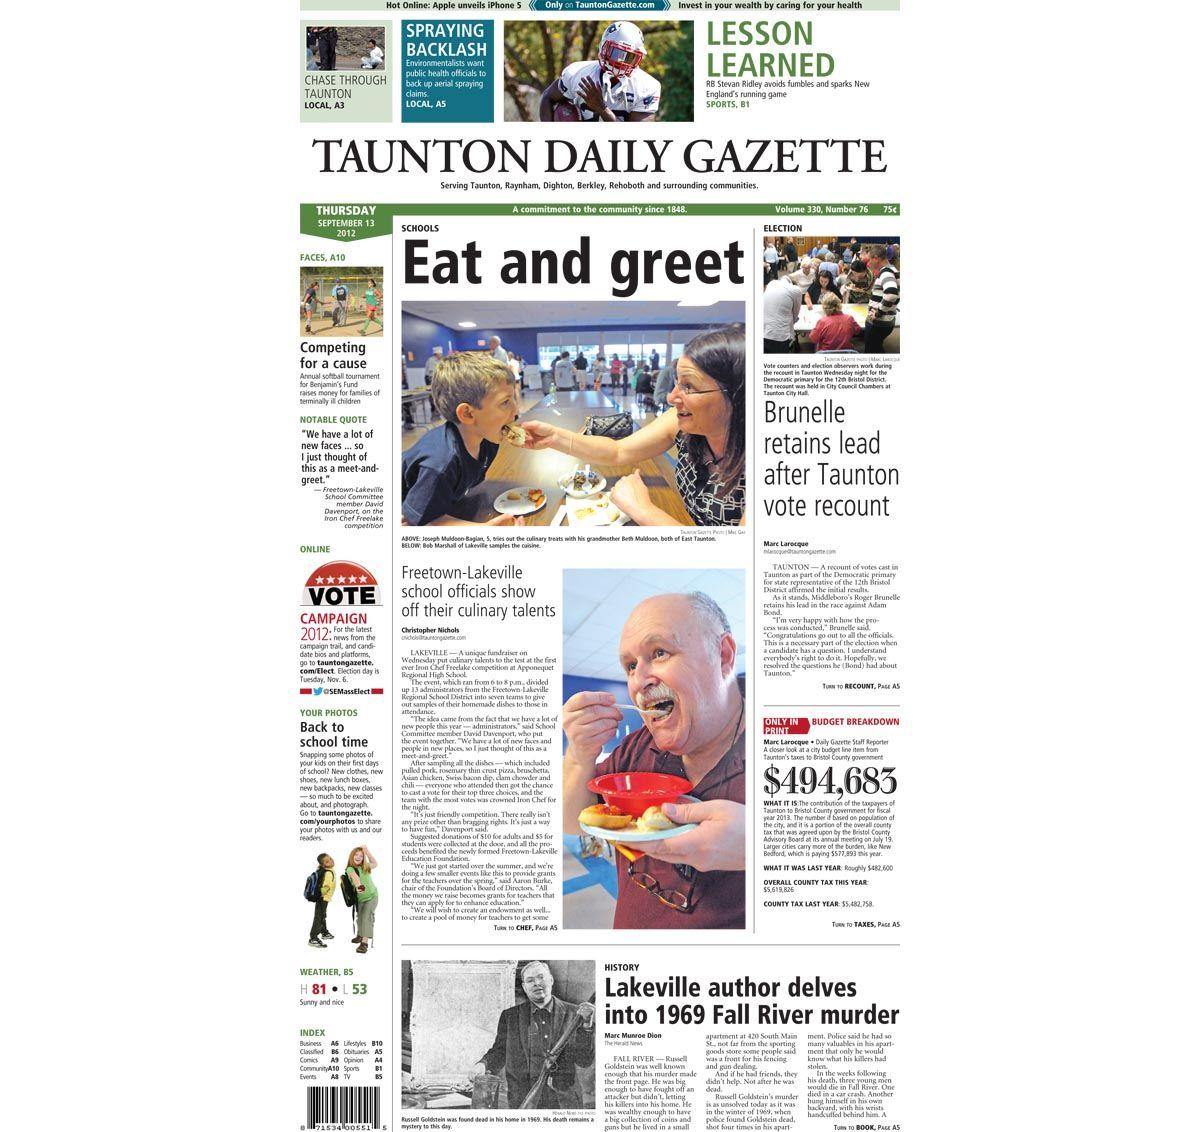 #TauntonGazette #FrontPage for Thursday, Sept. 13, 2012